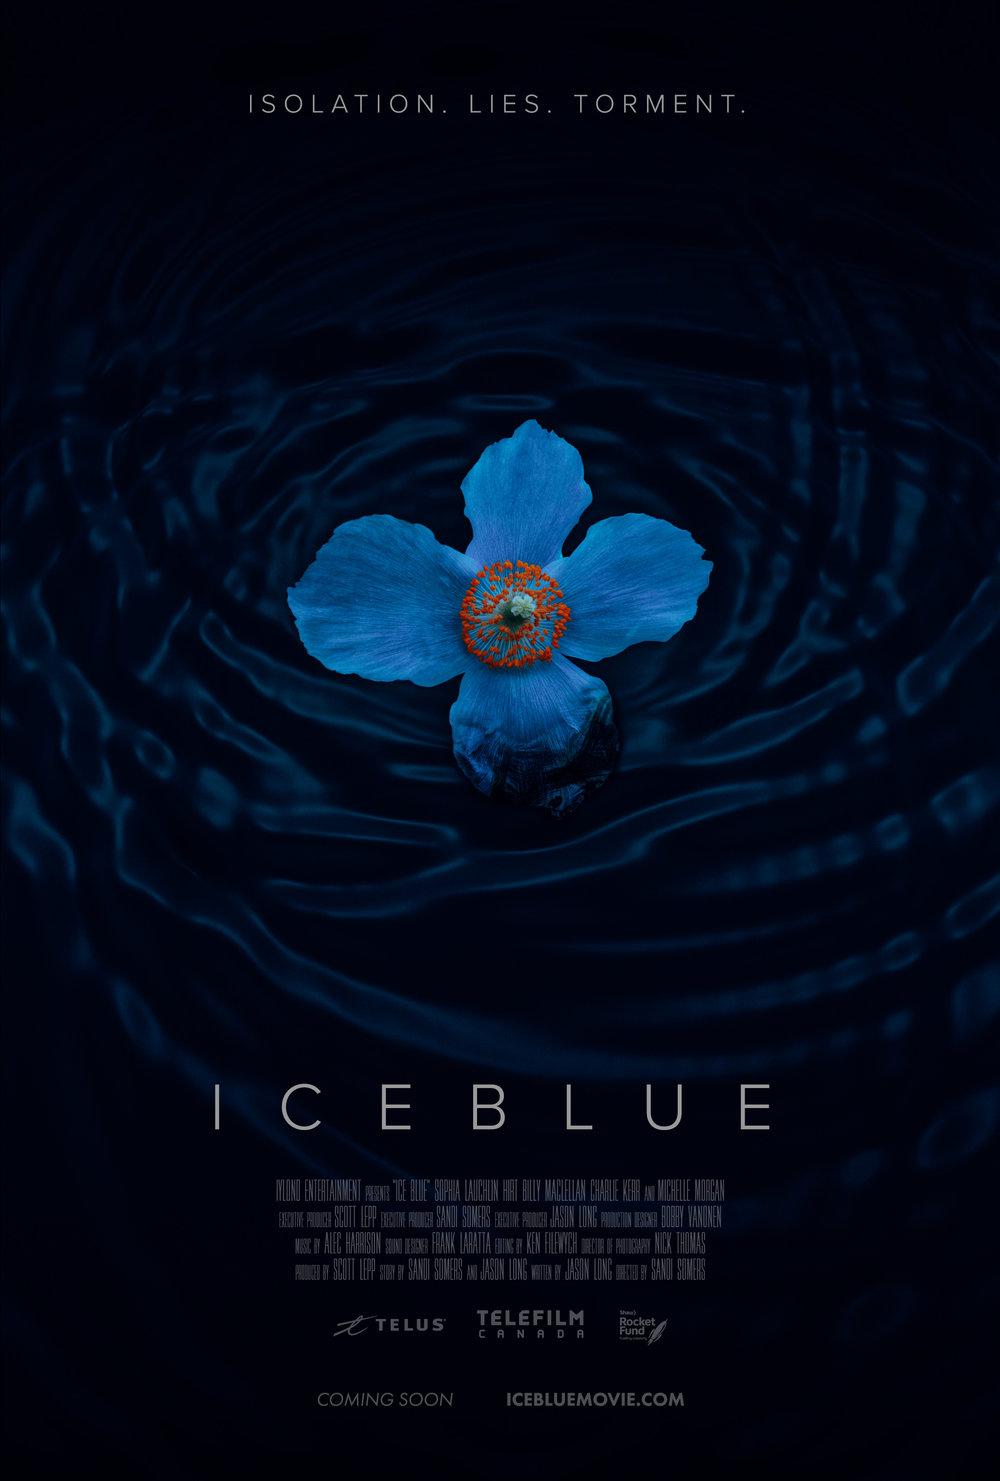 ICEBLUE_POSTER_V3_web.jpg